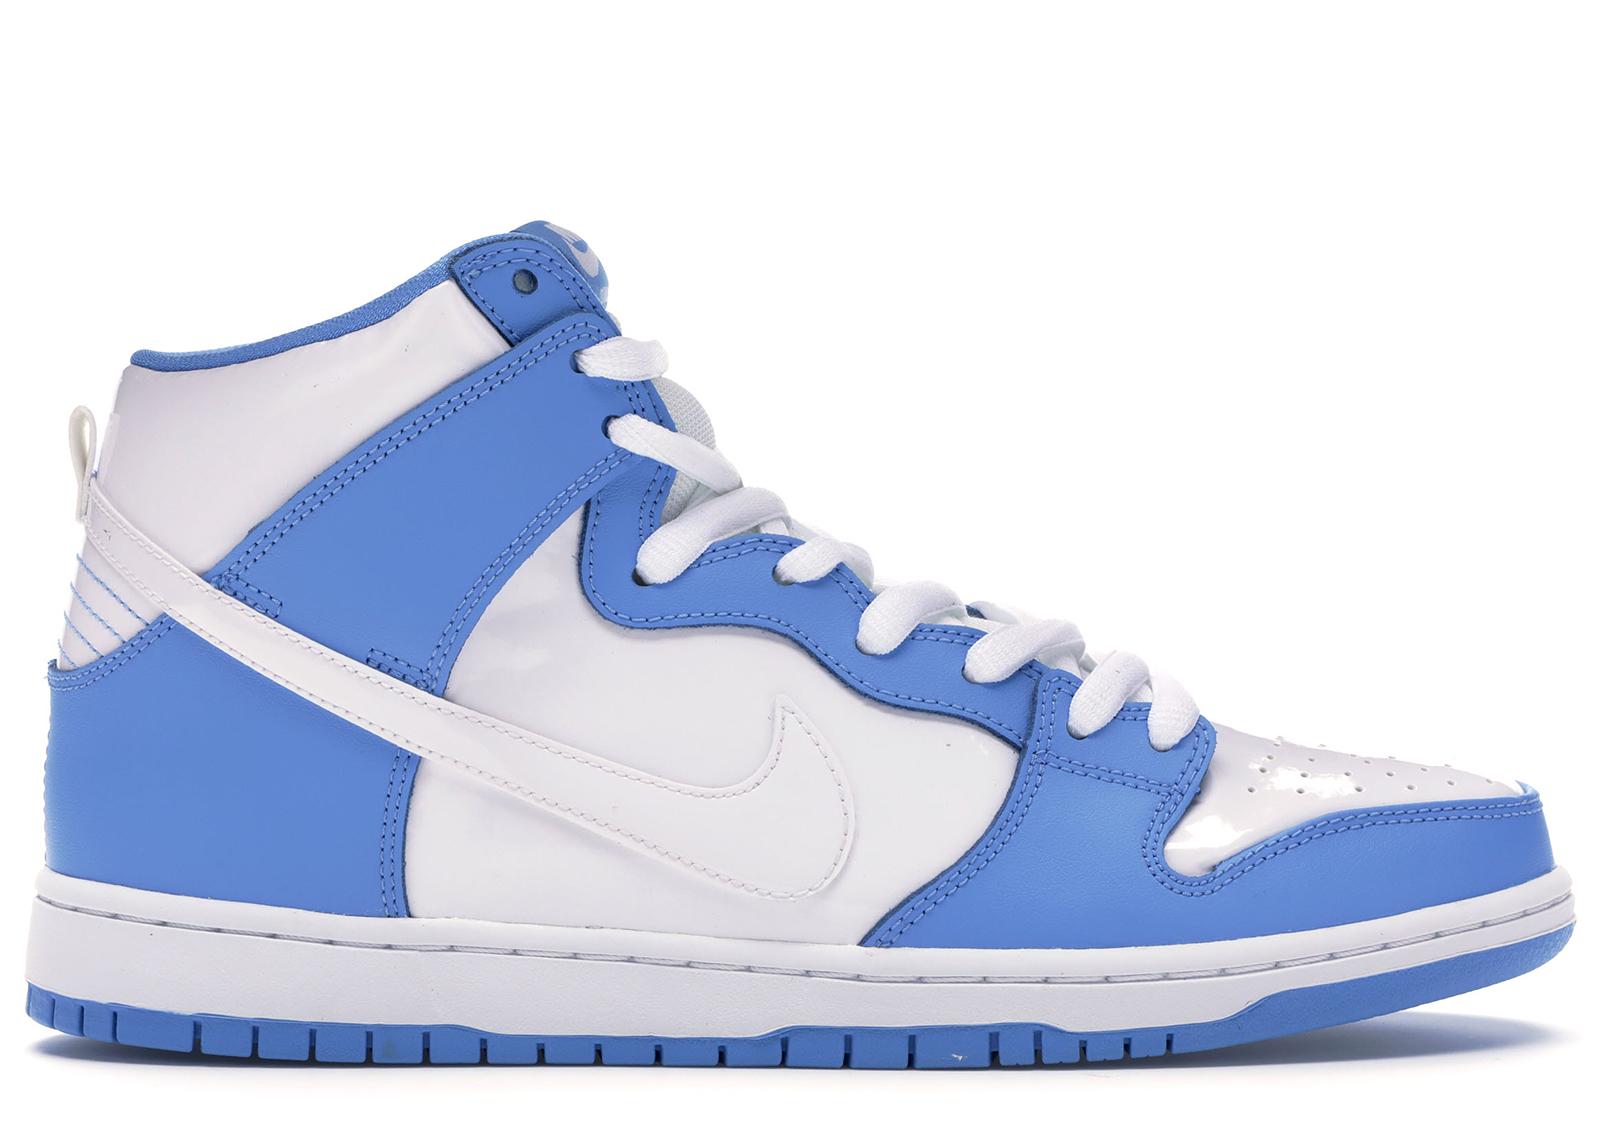 Nike Dunk SB High Rivalry - 313171-411